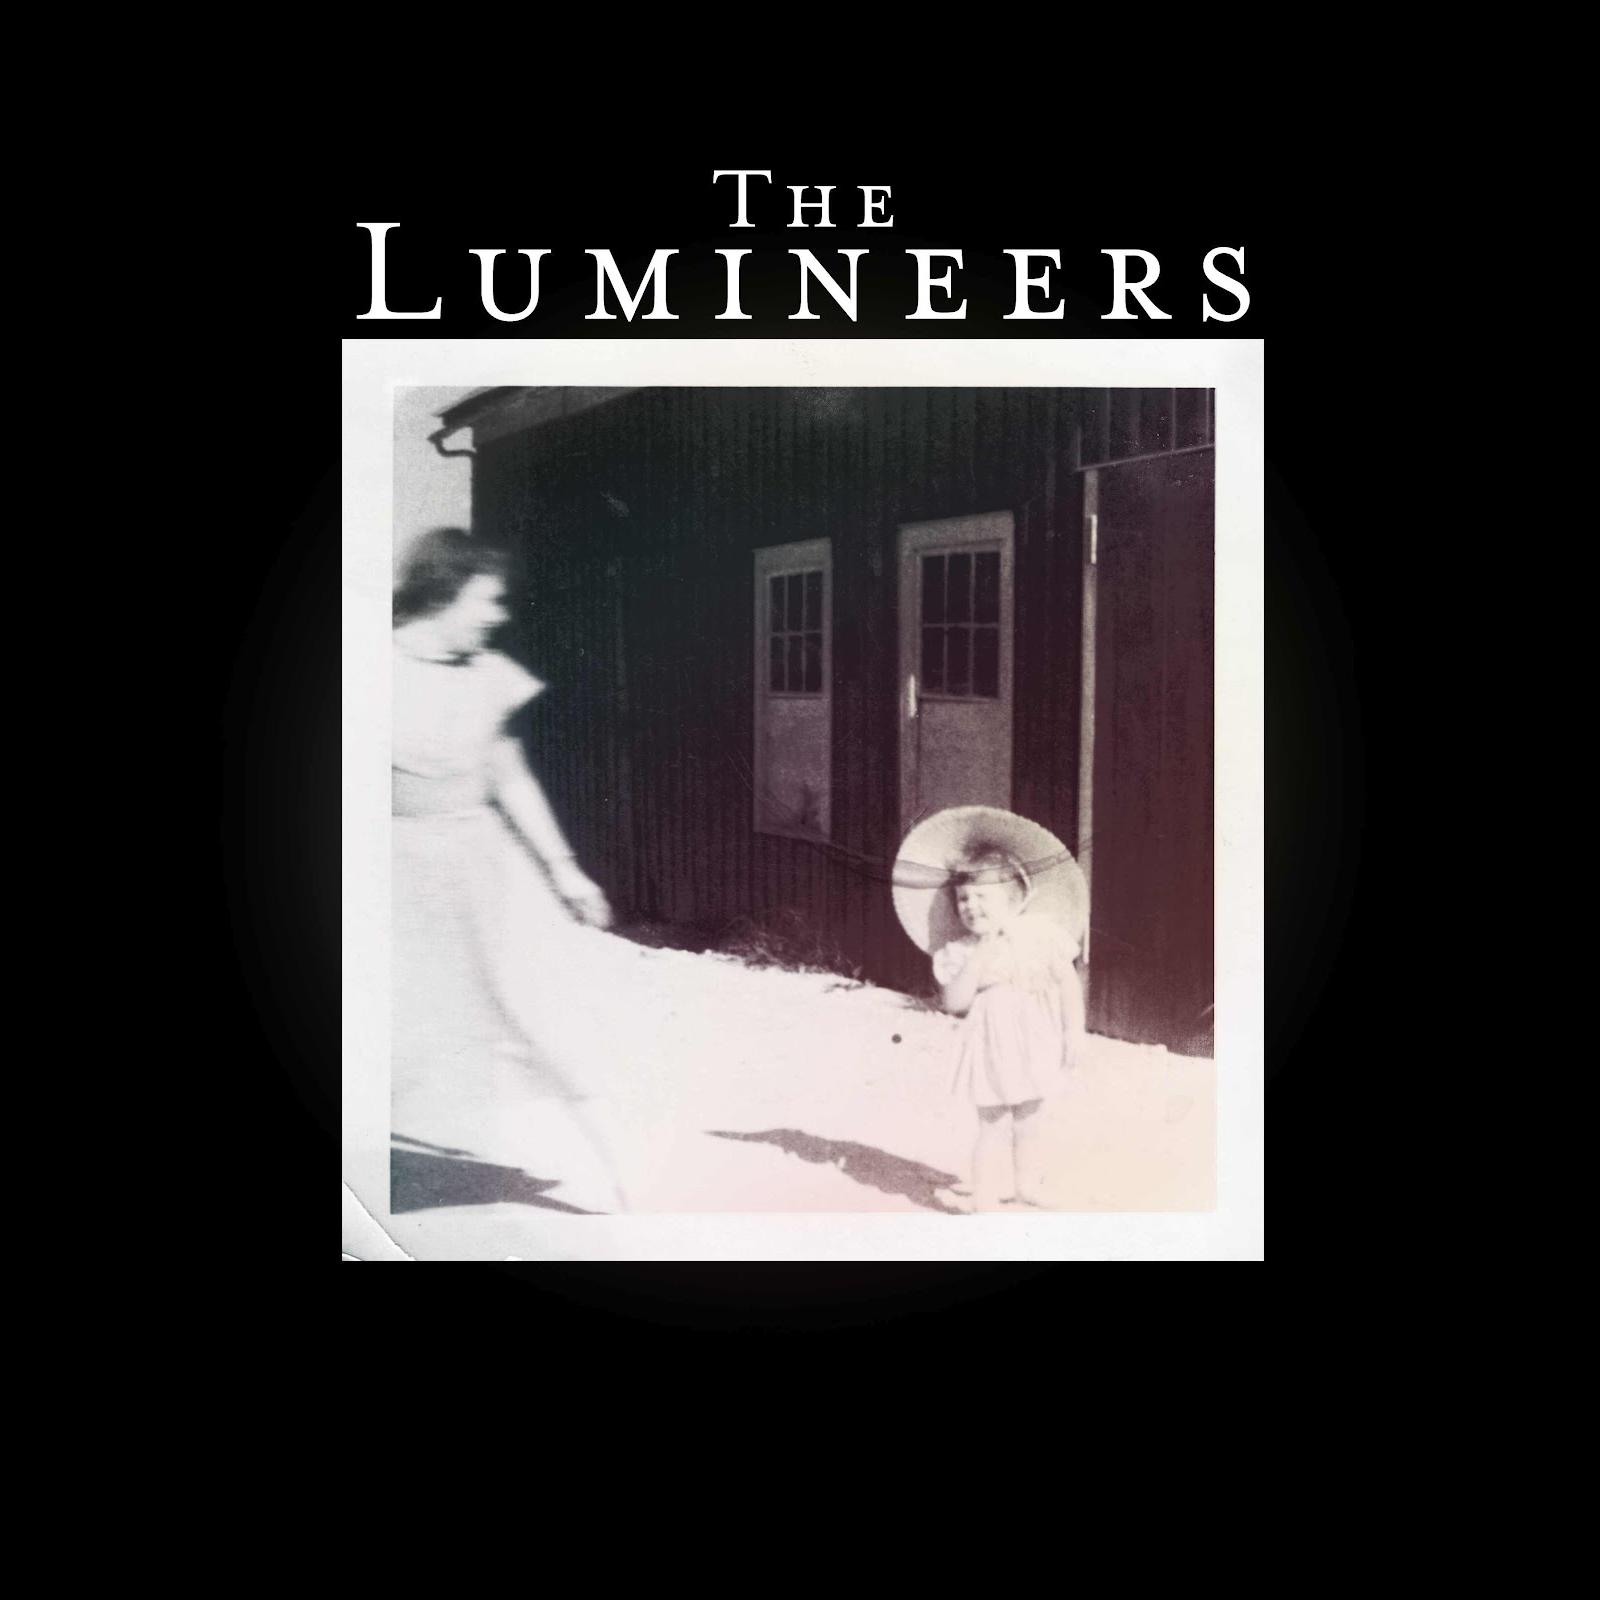 http://4.bp.blogspot.com/-bxG2l9N3xL8/UD14ir432gI/AAAAAAAABJI/oERHt-Qm4QY/s1600/The+Lumineers.png